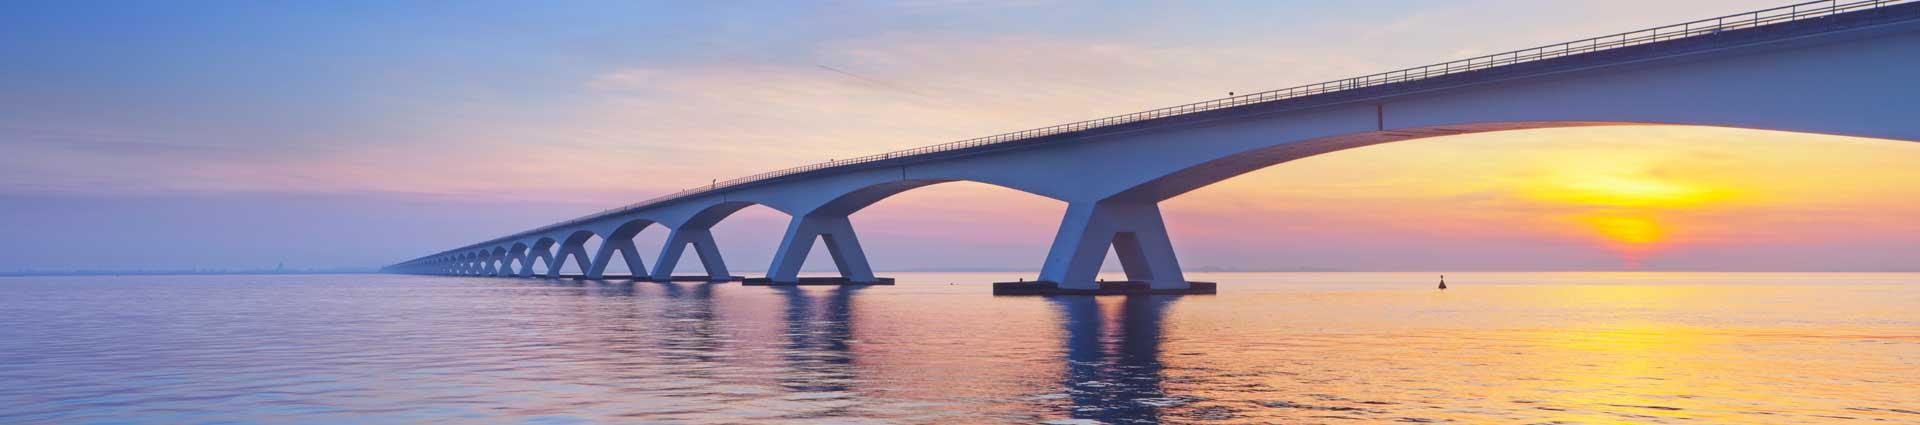 Bridging-the-content-marketing-gap.jpg